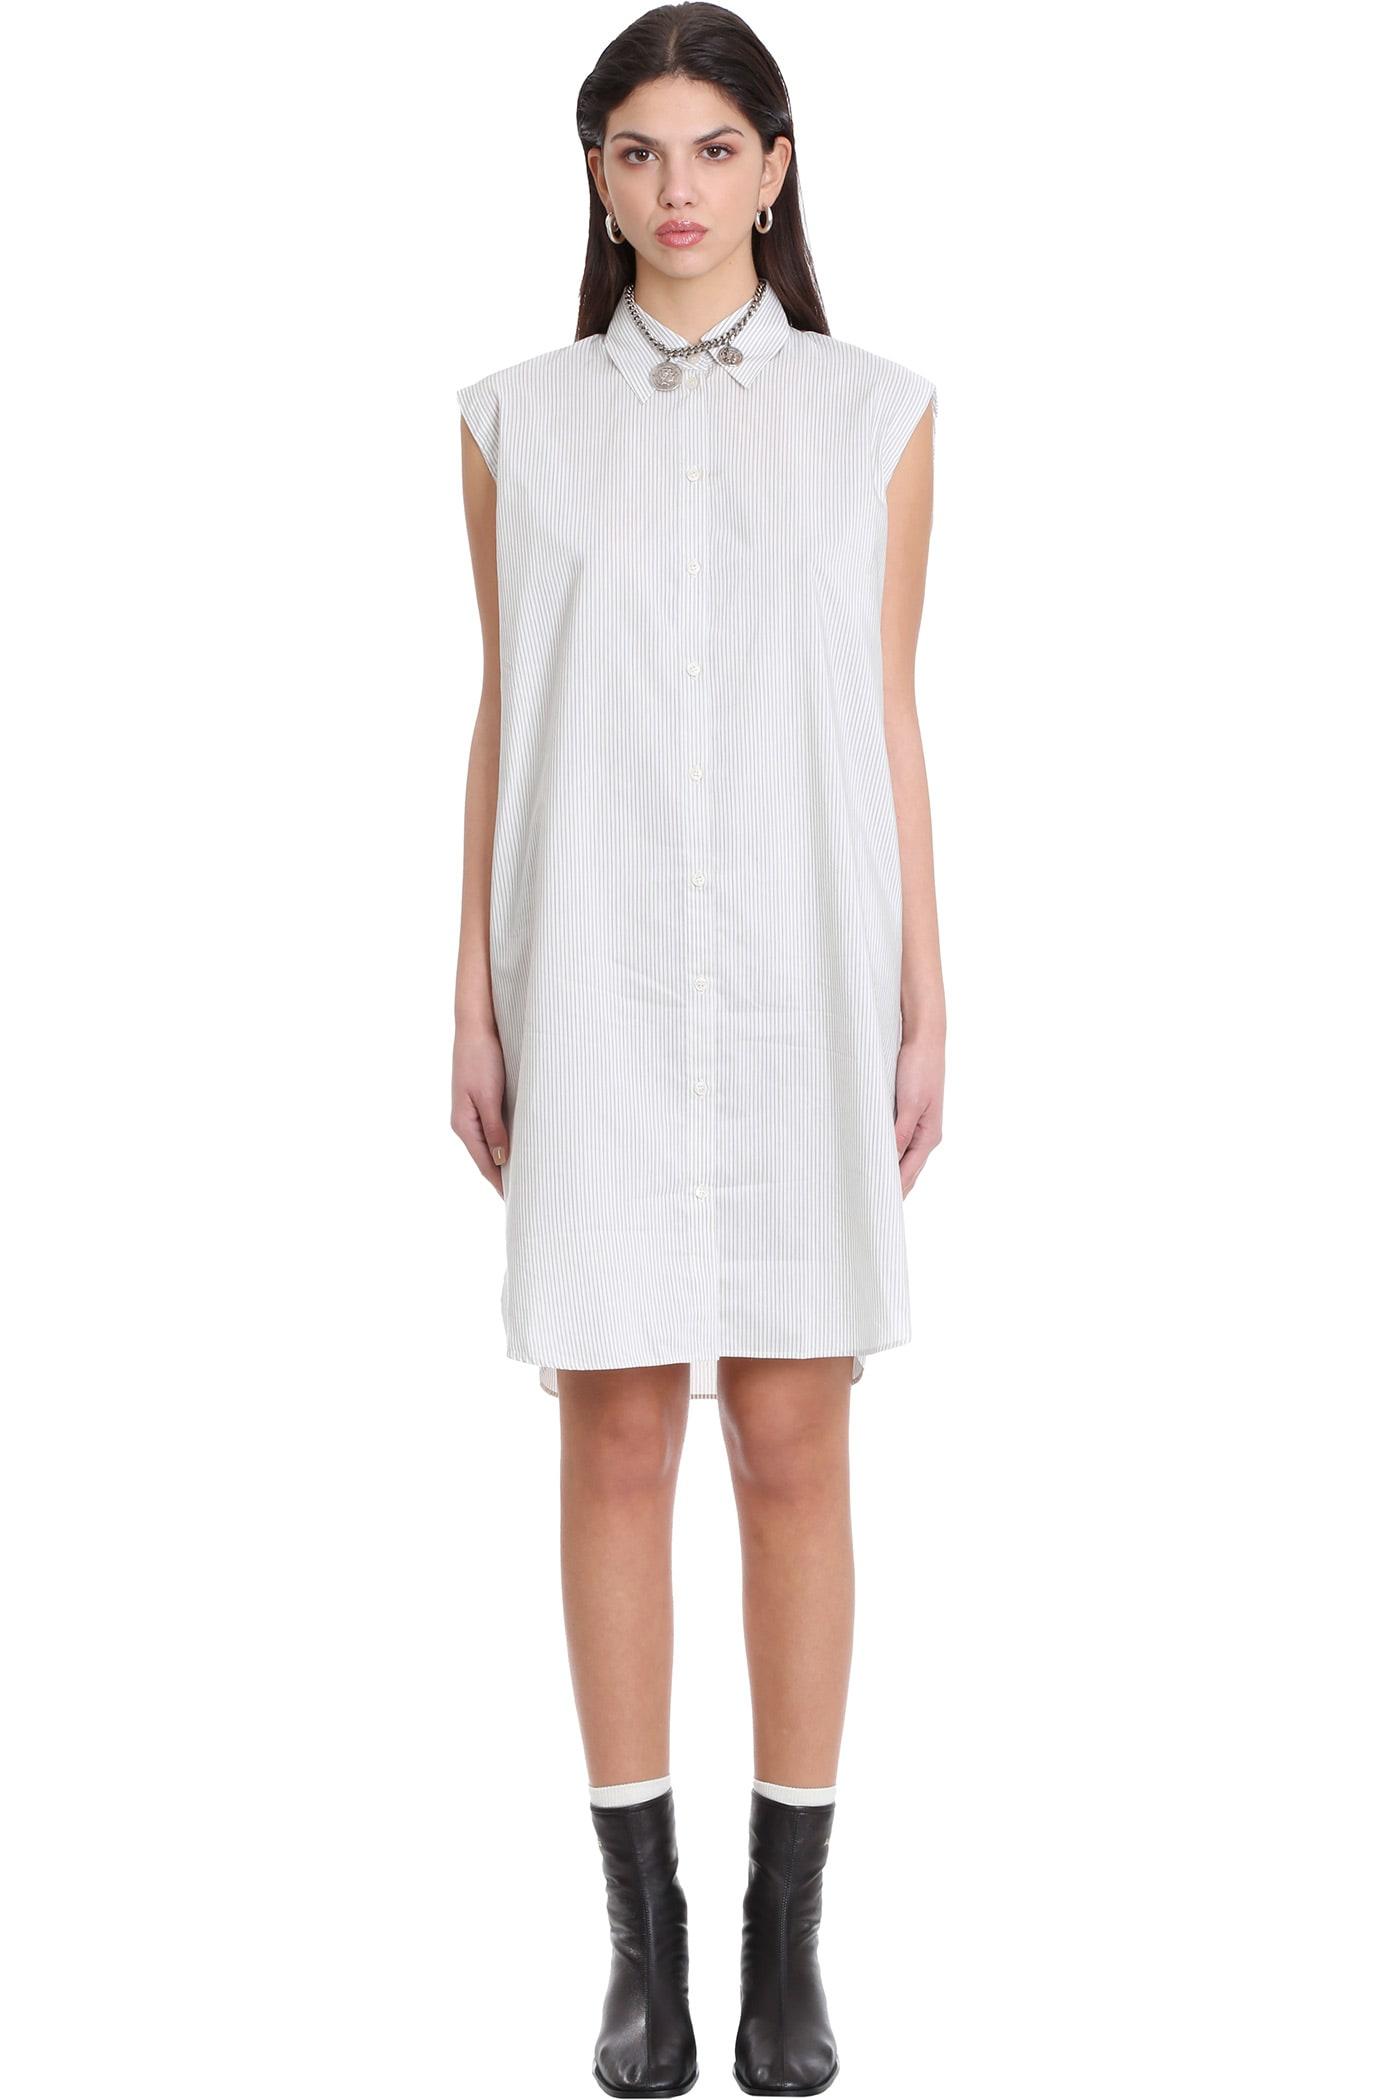 Acne Studios Devora Dress In Beige Cotton